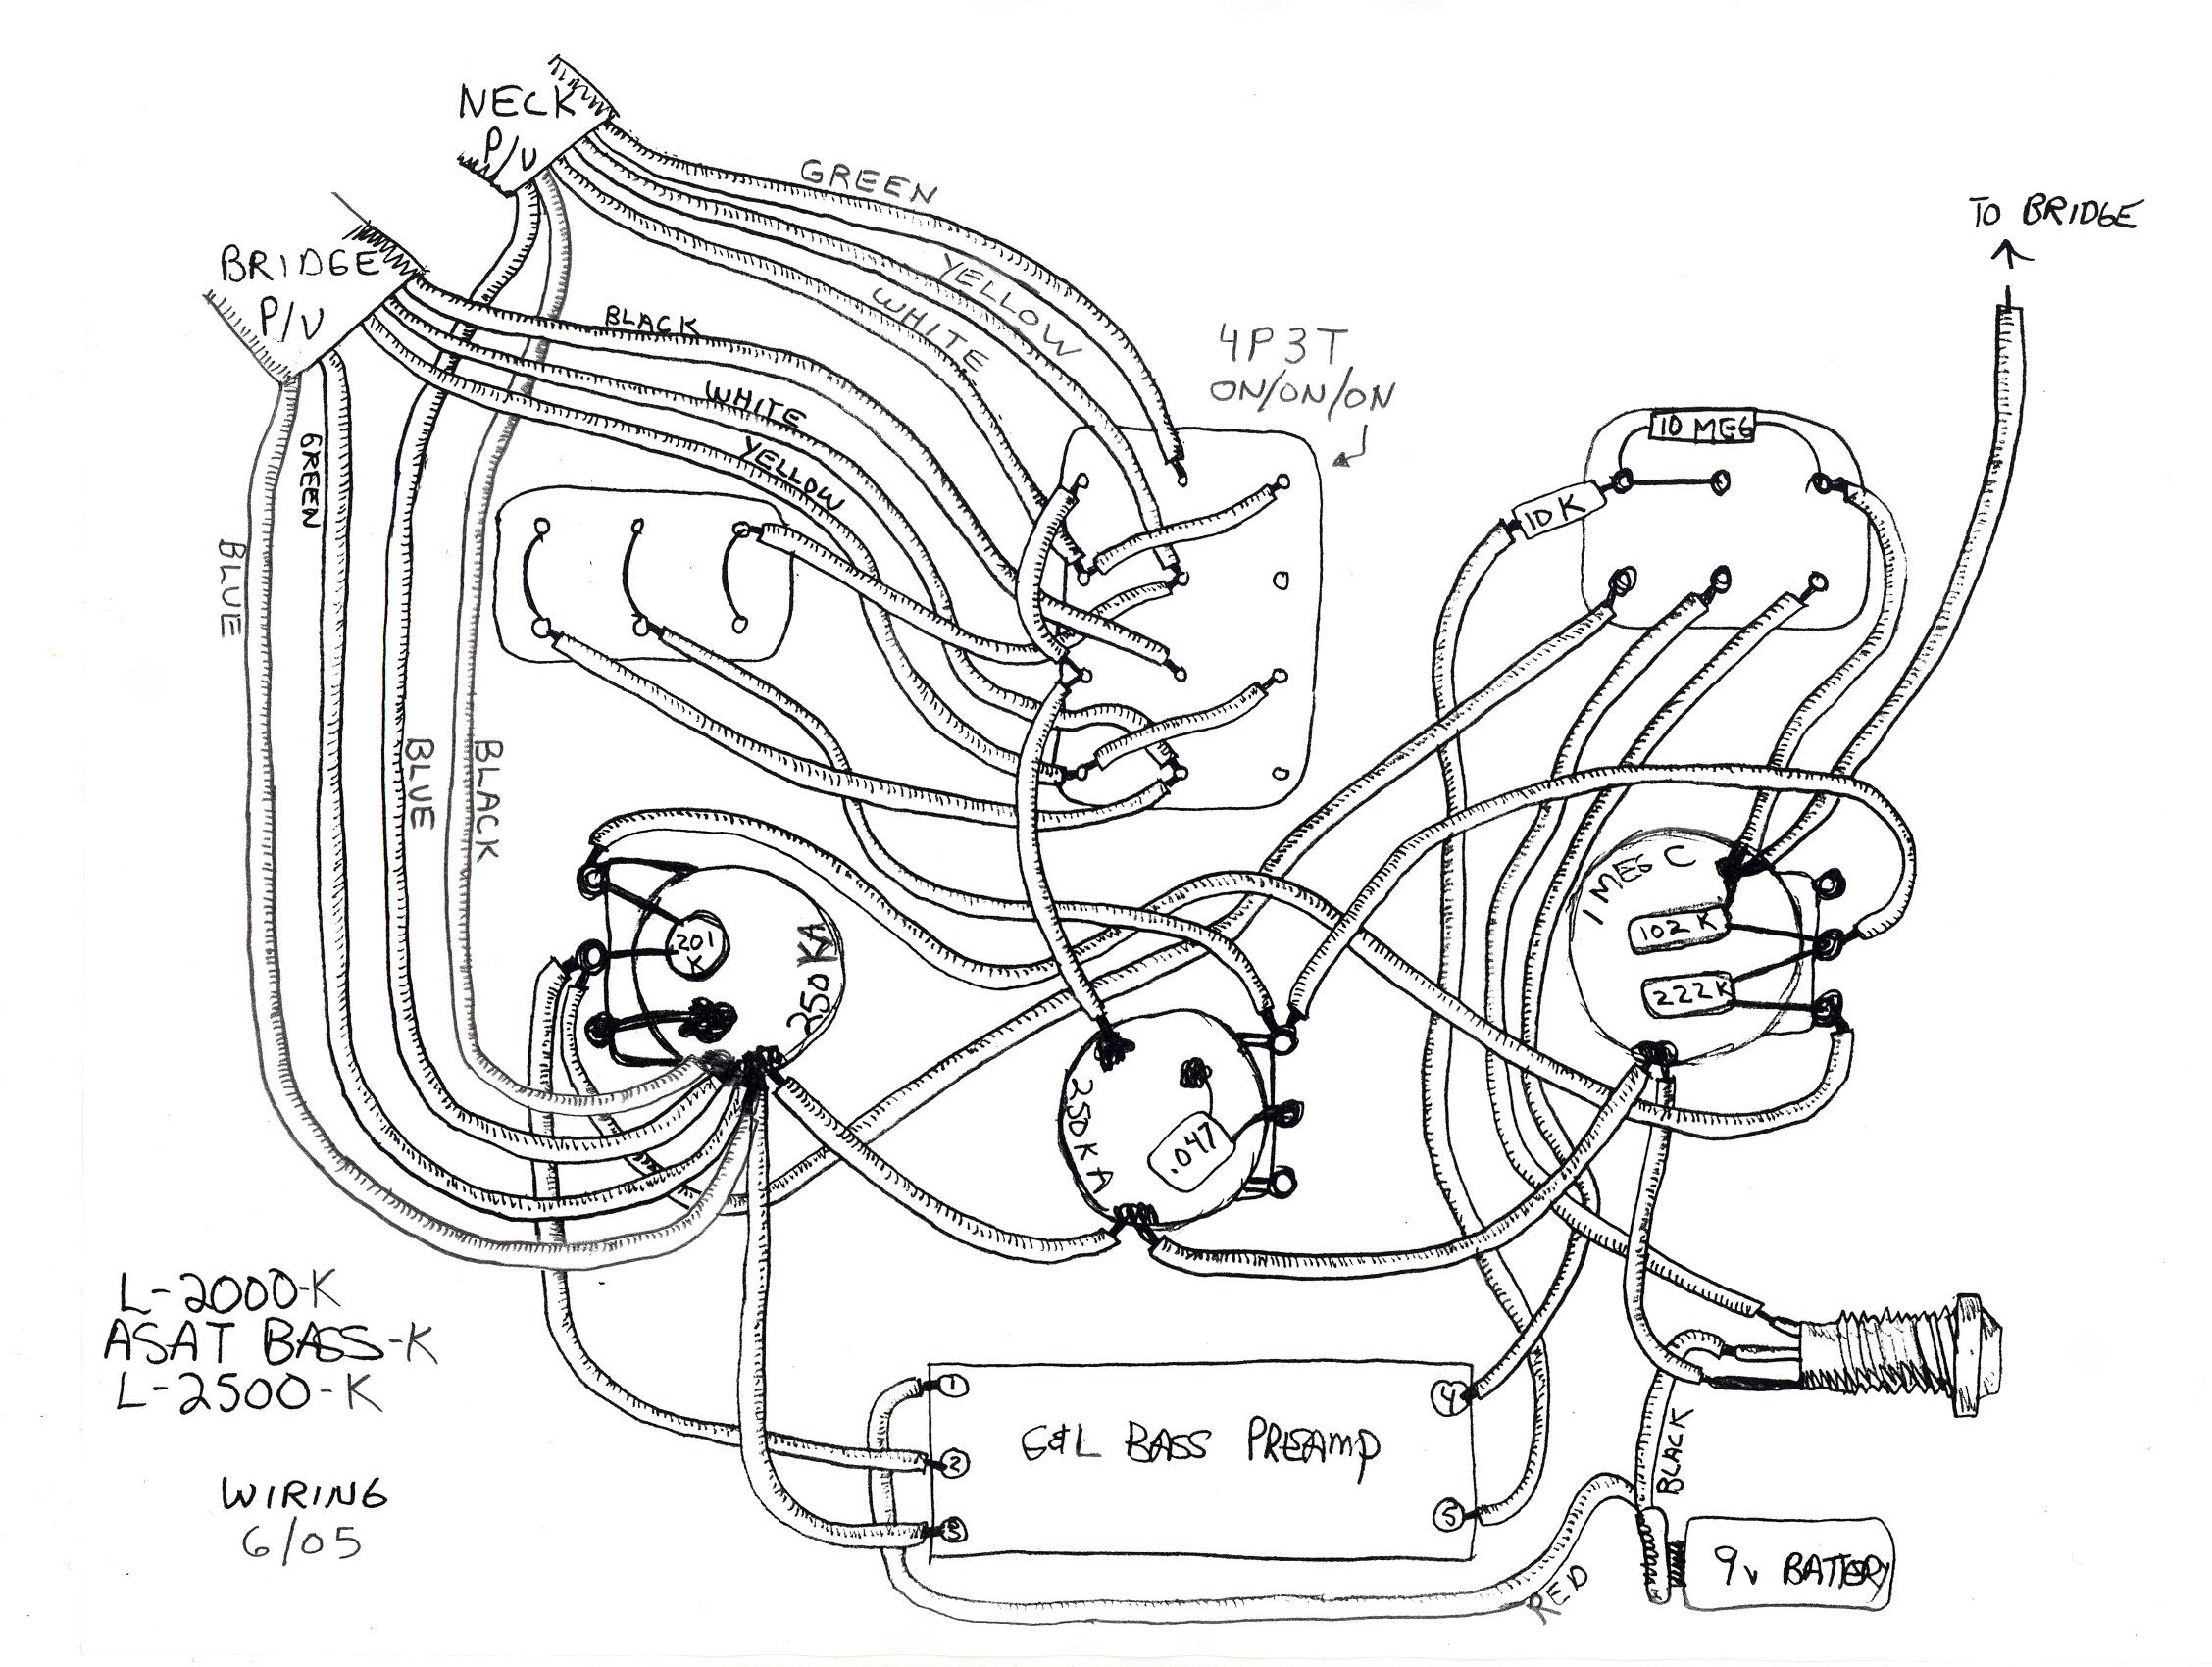 l2000k?resize=665%2C501 g l l2000 tribute wiring diagram wiring diagram Basic Electrical Wiring Diagrams at soozxer.org